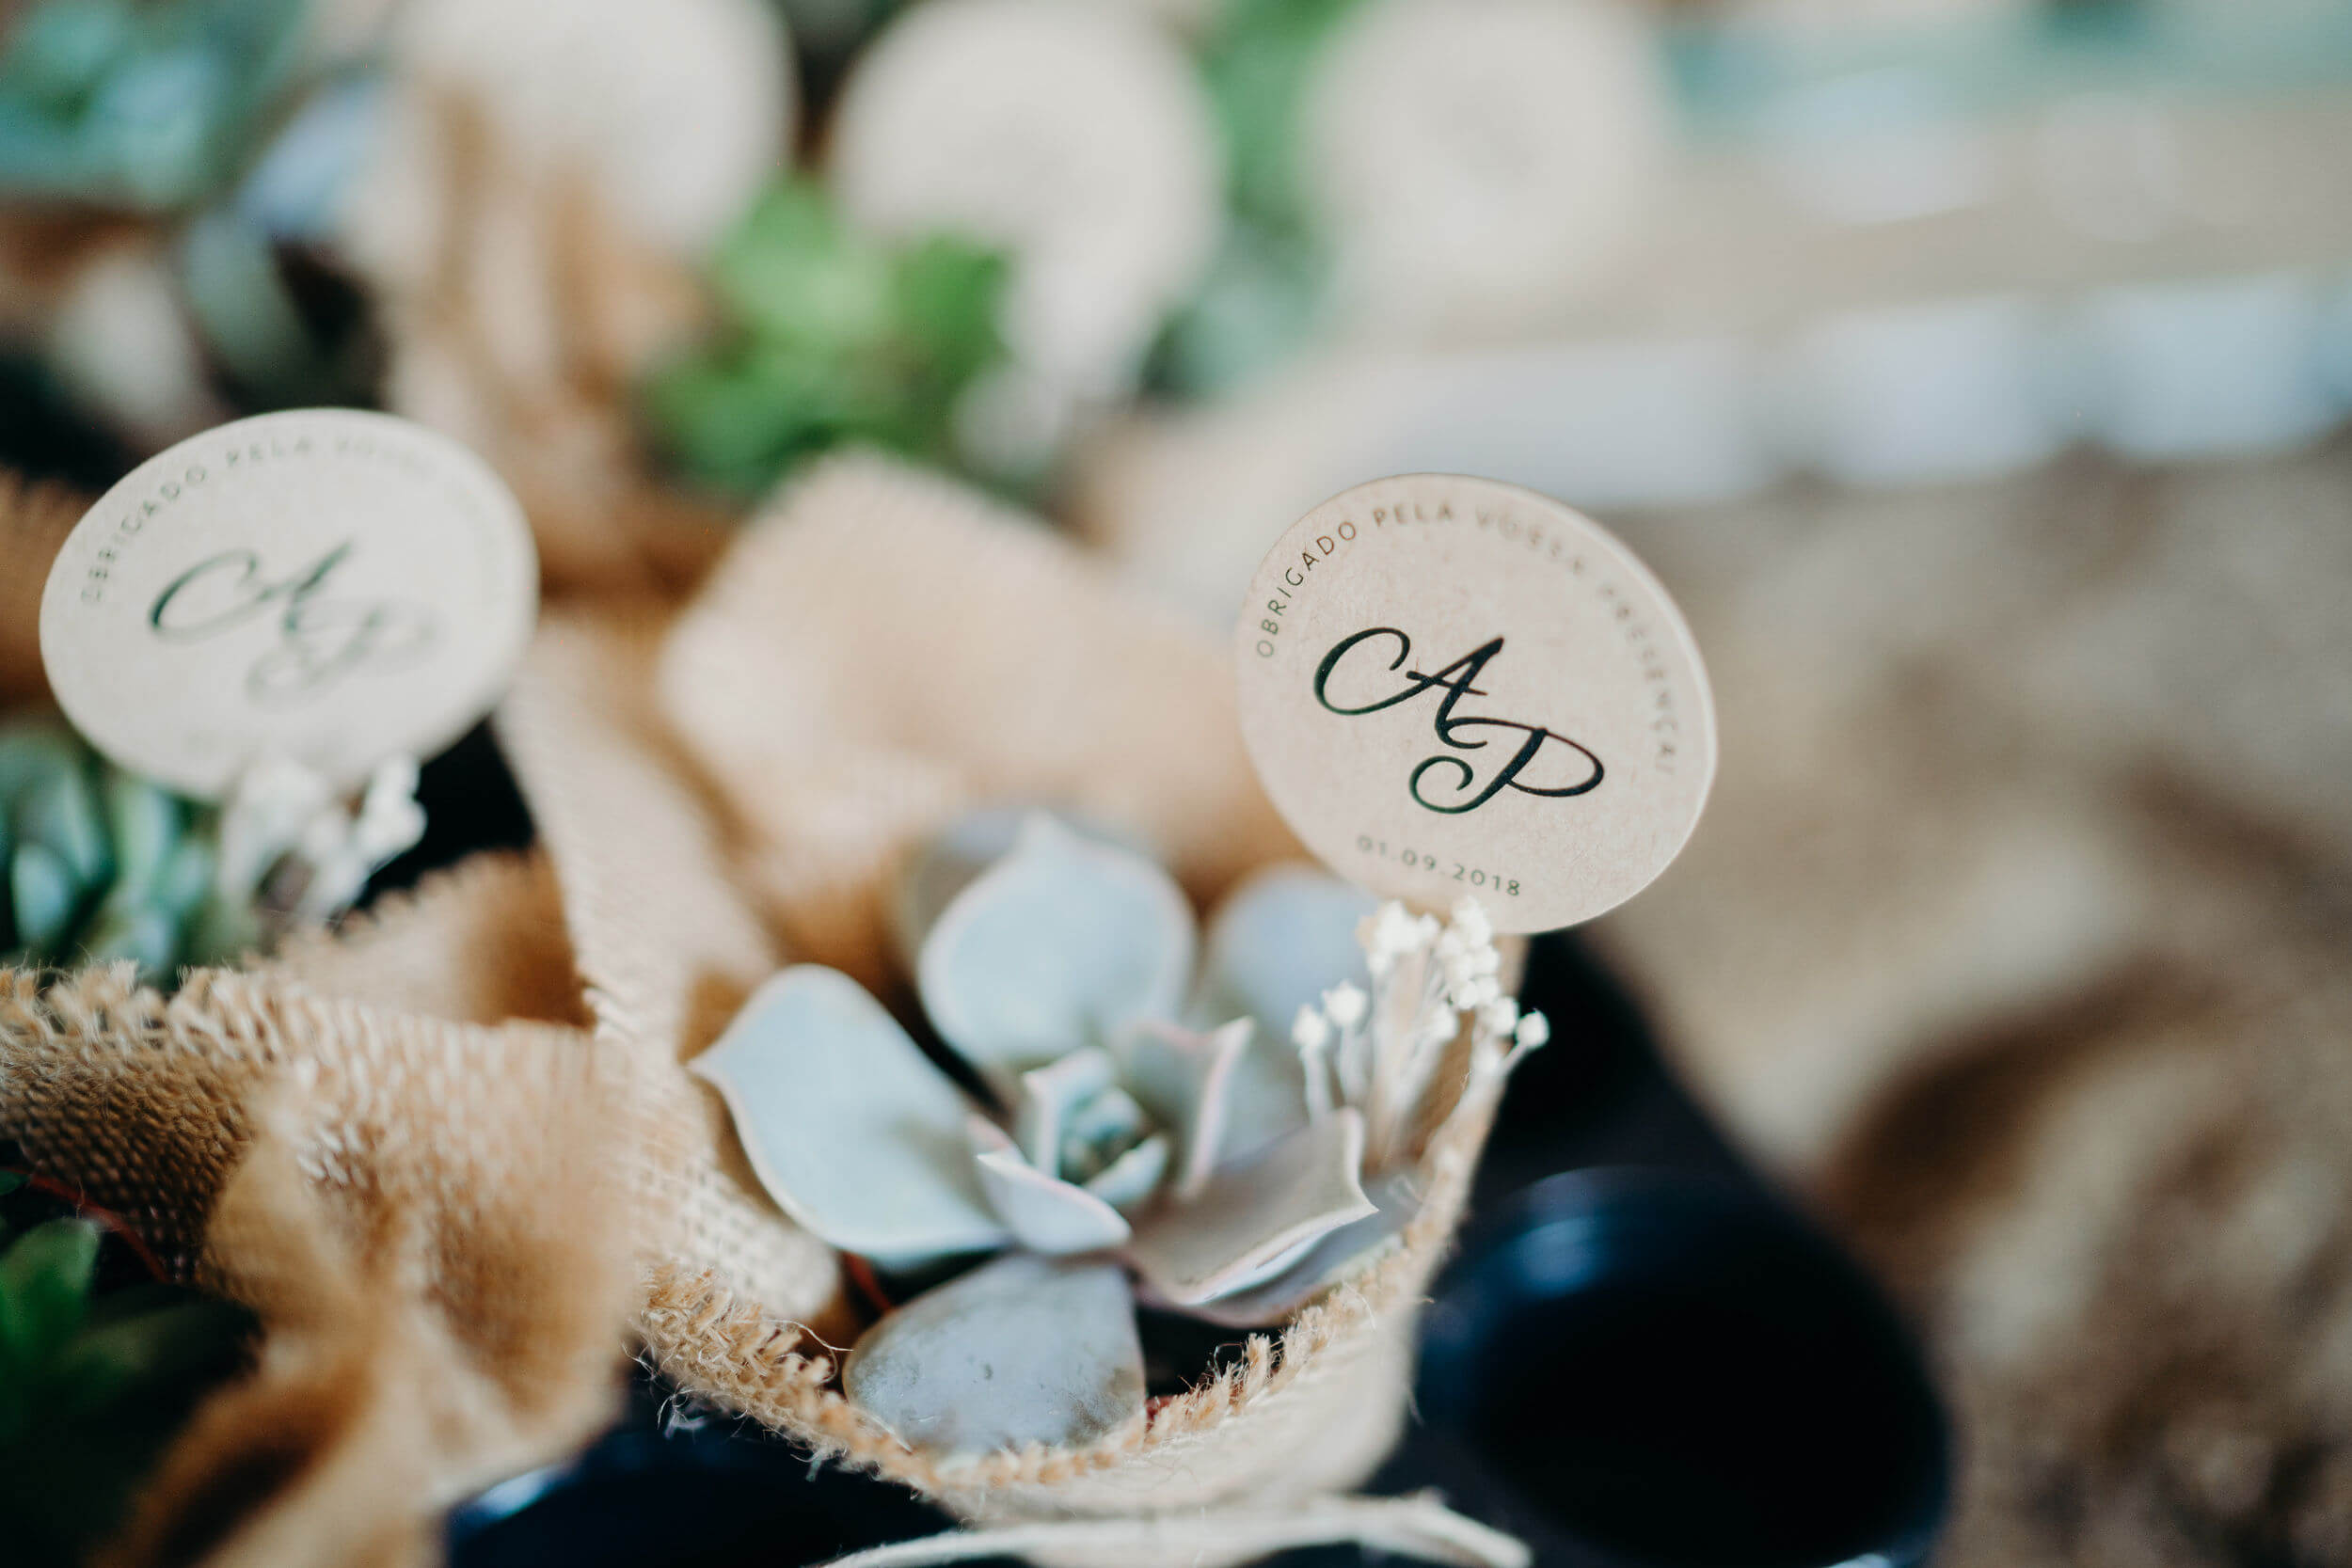 roma-organizacao-eventos-casamento-ana-e-pedro-26